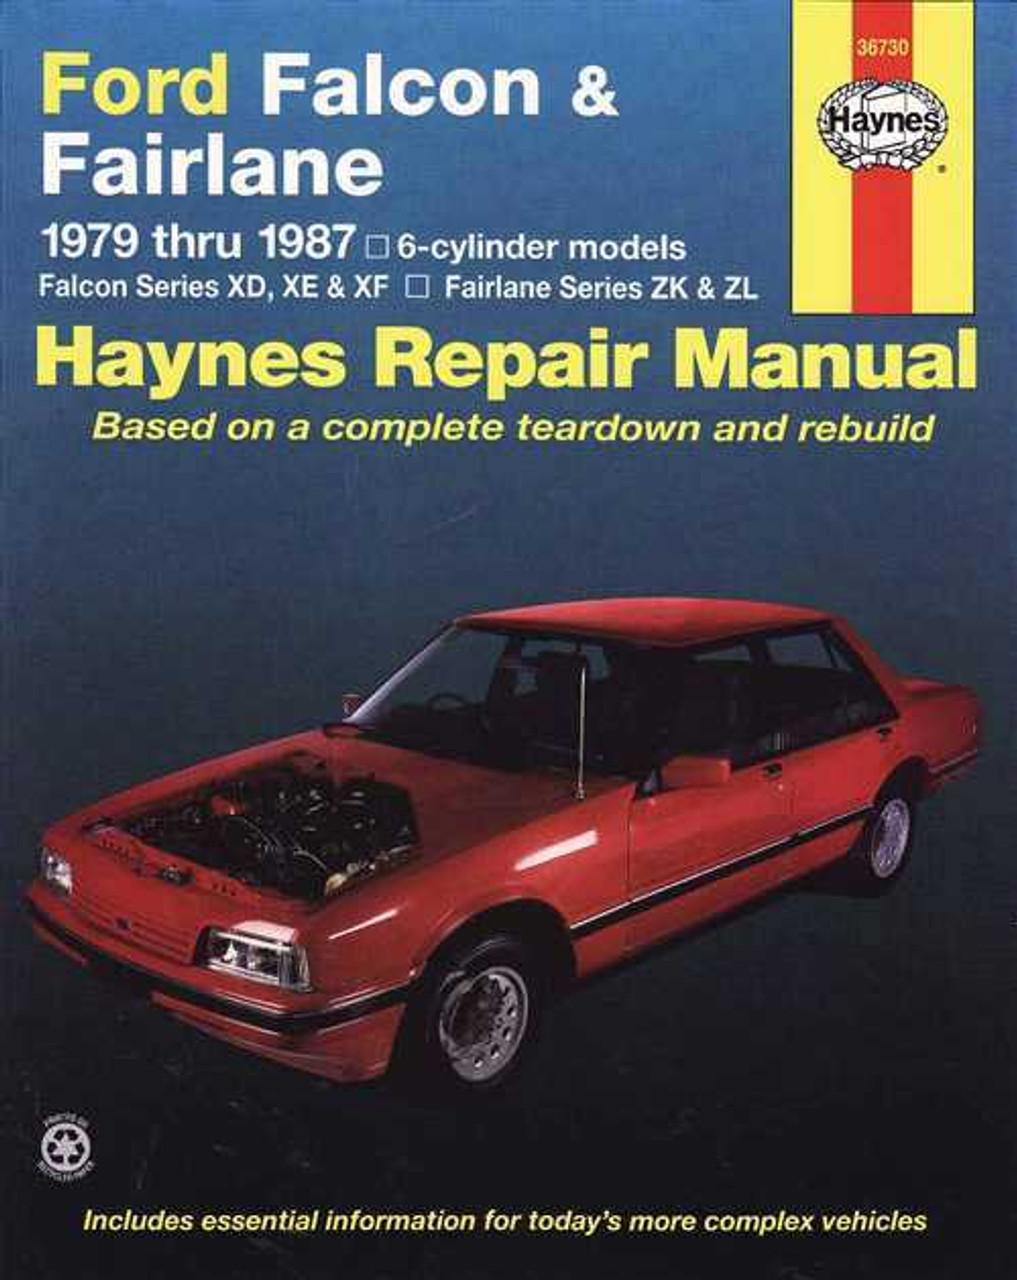 ford falcon amp fairlane 1979 1987 workshop manual rh automotobookshop com au ba falcon service manual pdf download ba falcon service manual pdf download